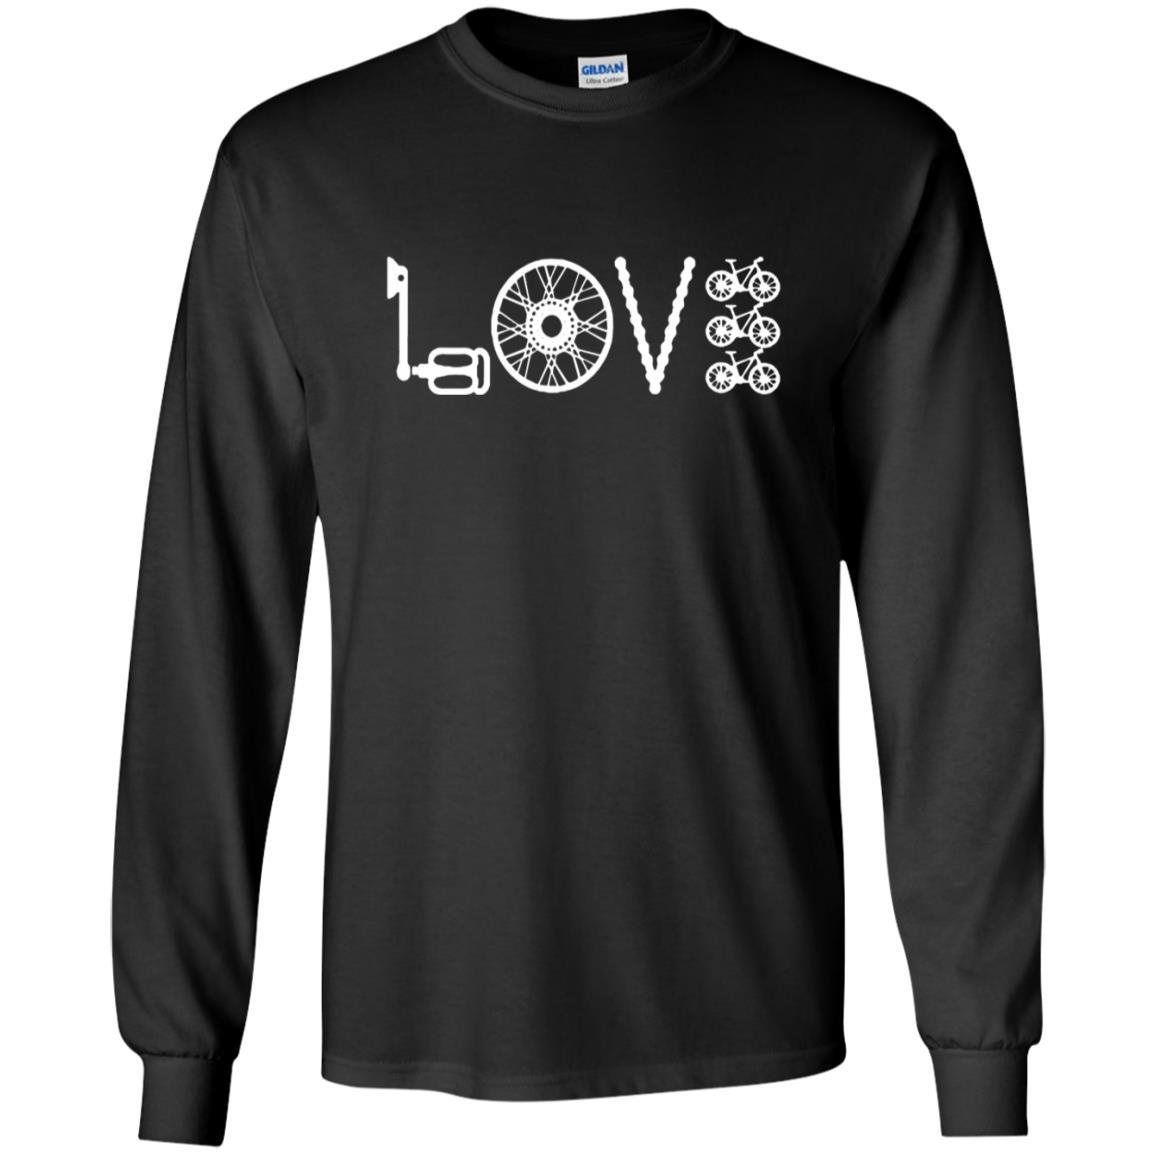 I Love Cycling T Shirt 10 Off Favormerch